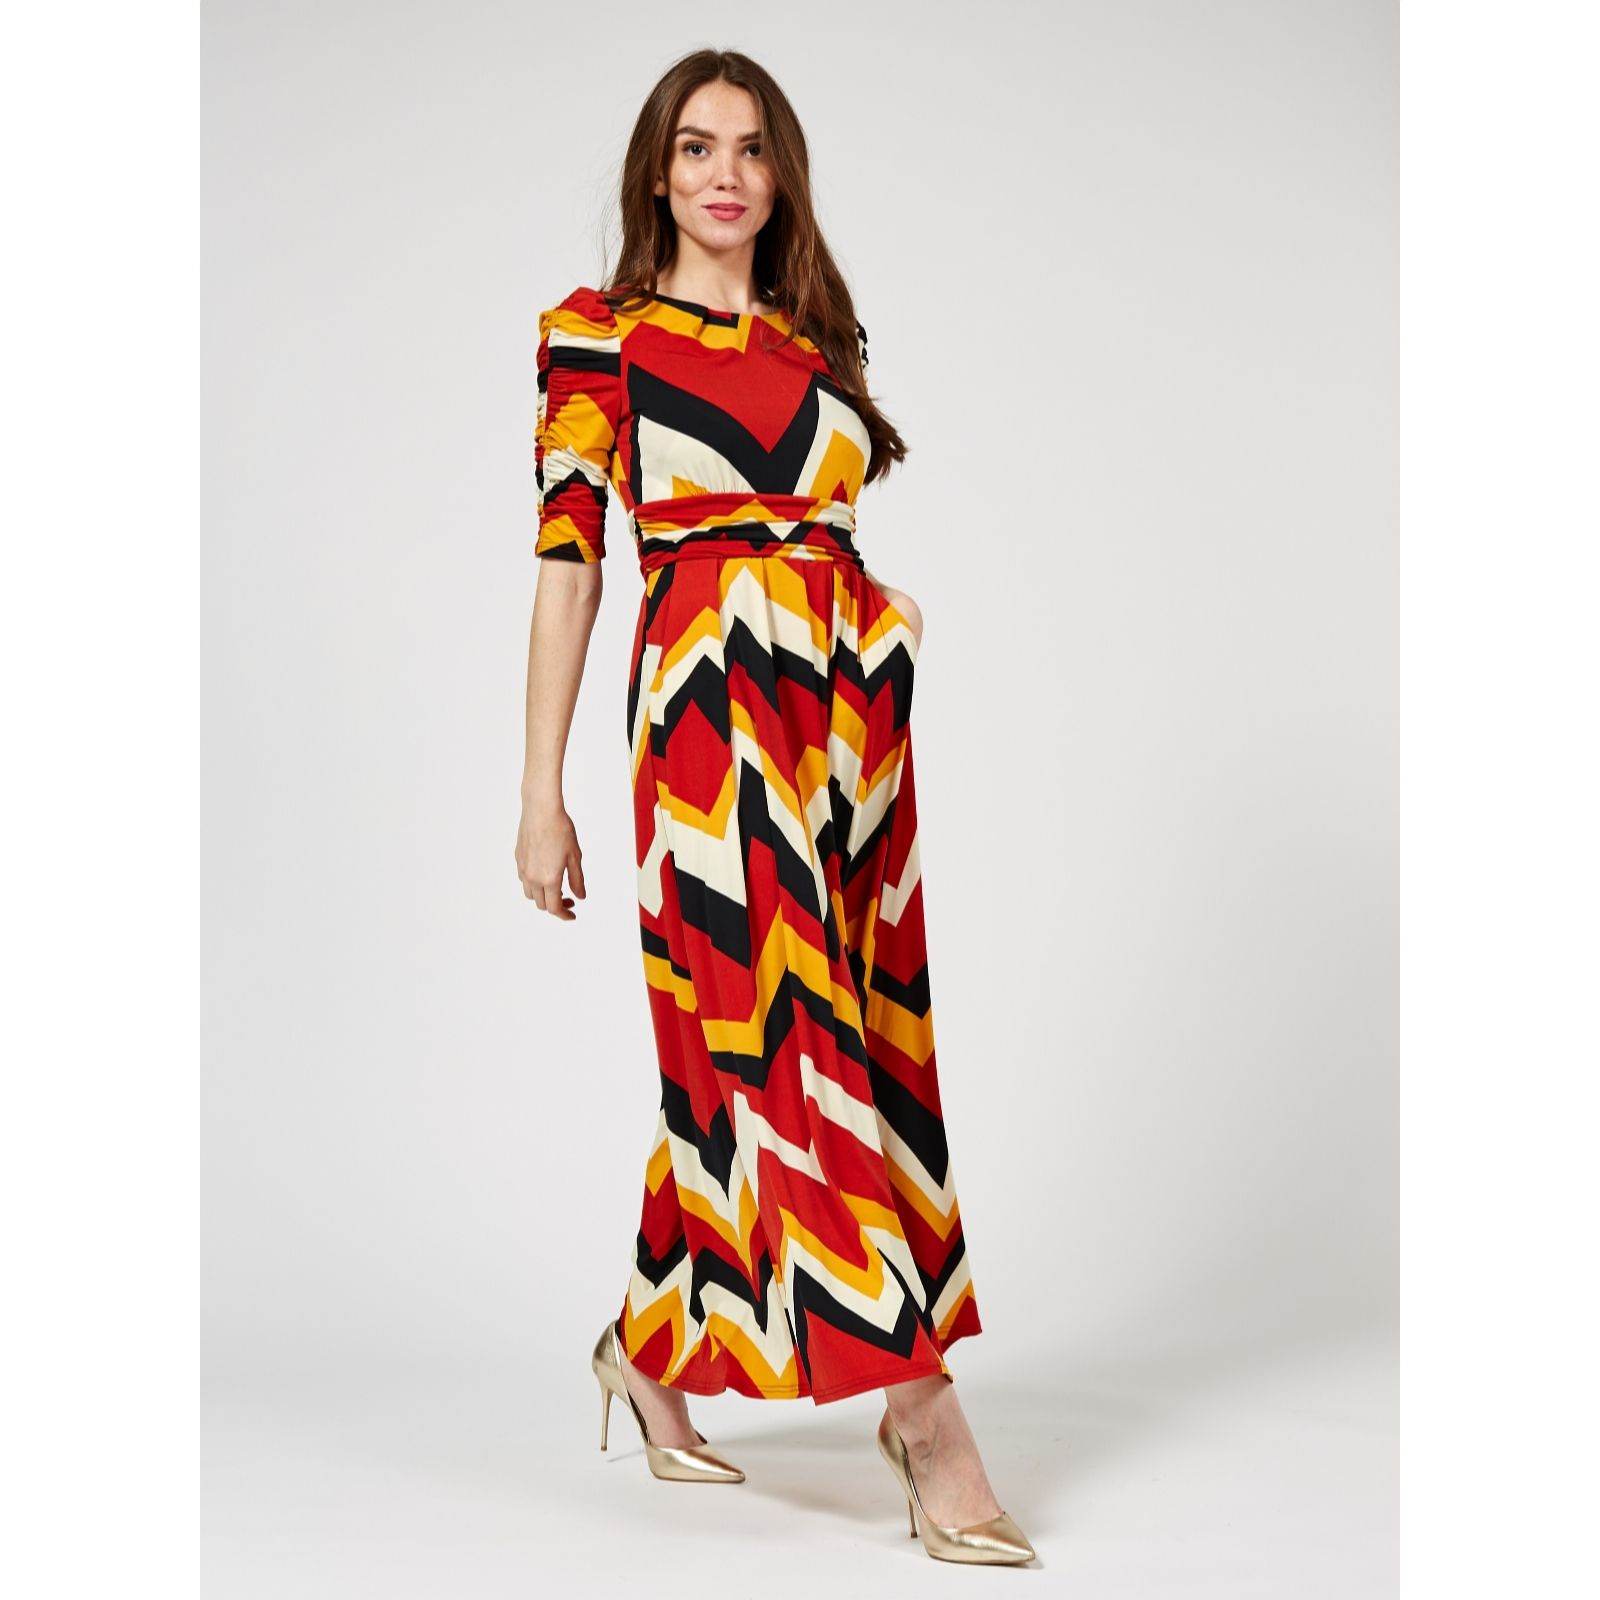 c4ab01433546 Jolie Moi Leah Printed Maxi Dress - QVC UK